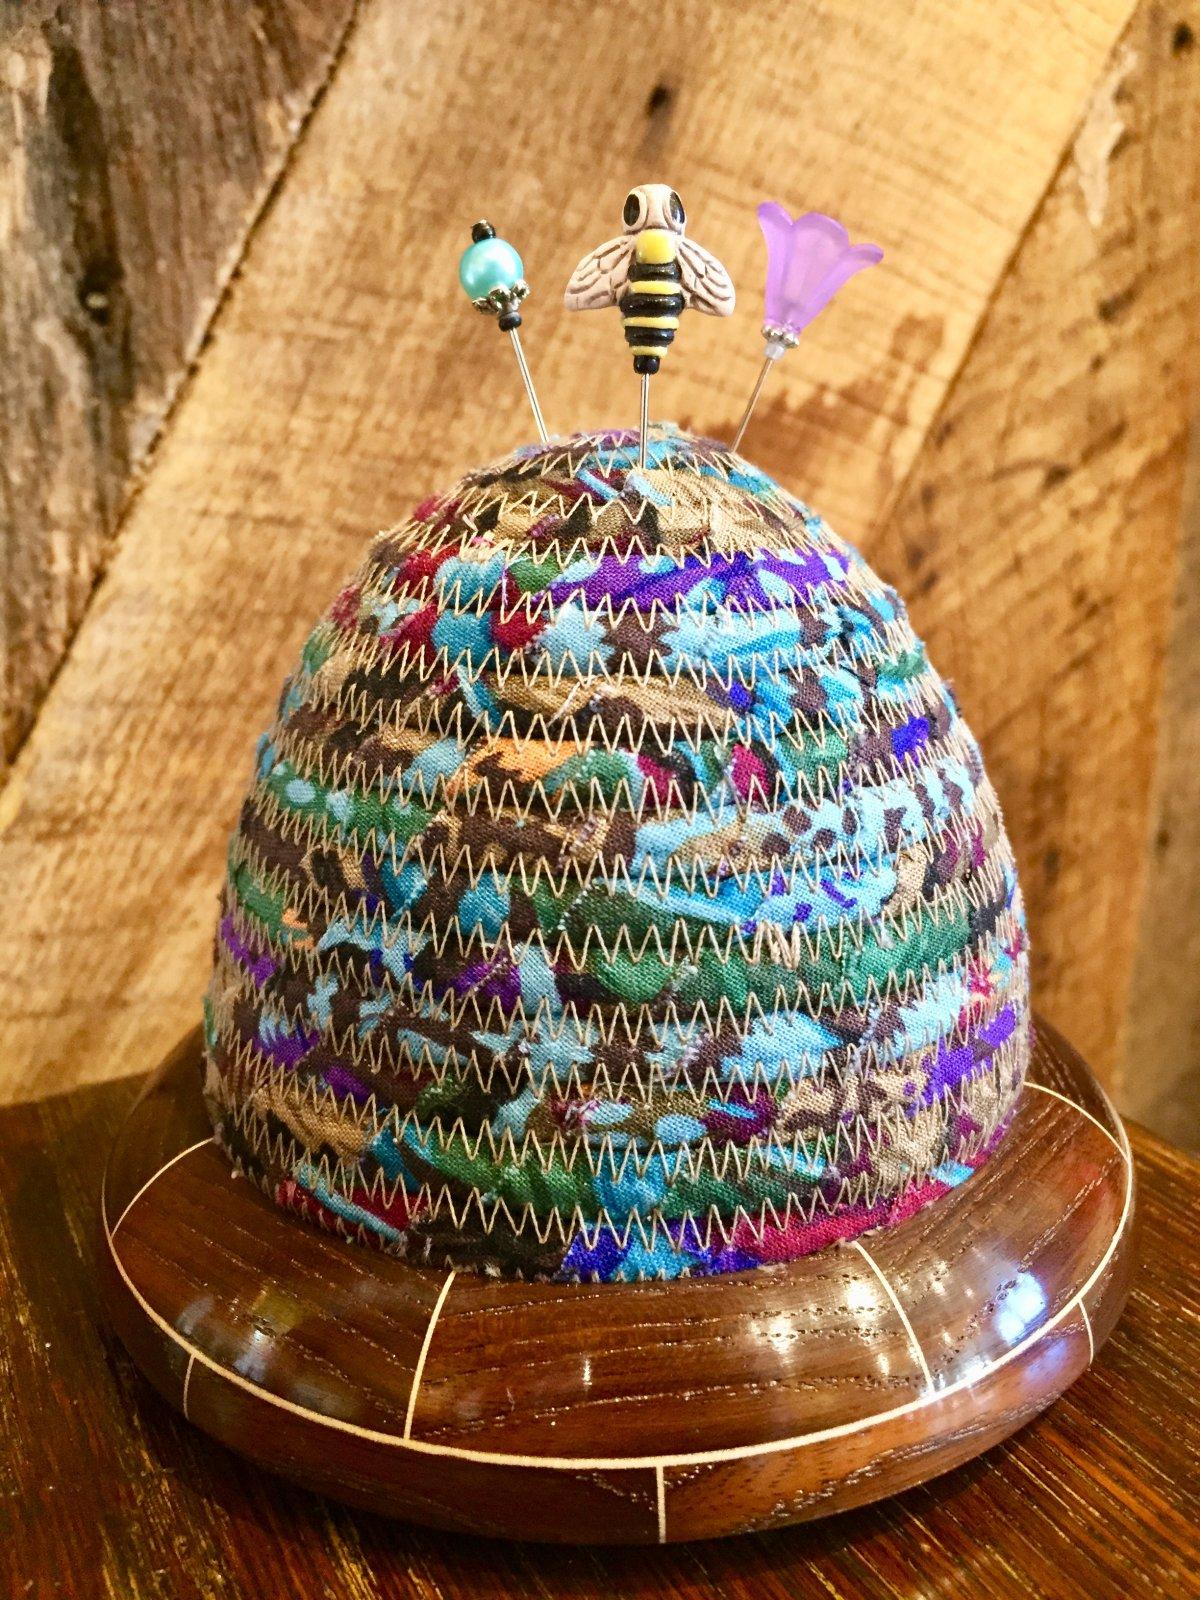 Beehive Pincushion - Kaffe Fassett Feathers Autumn Top - HT Ash / Maple Base